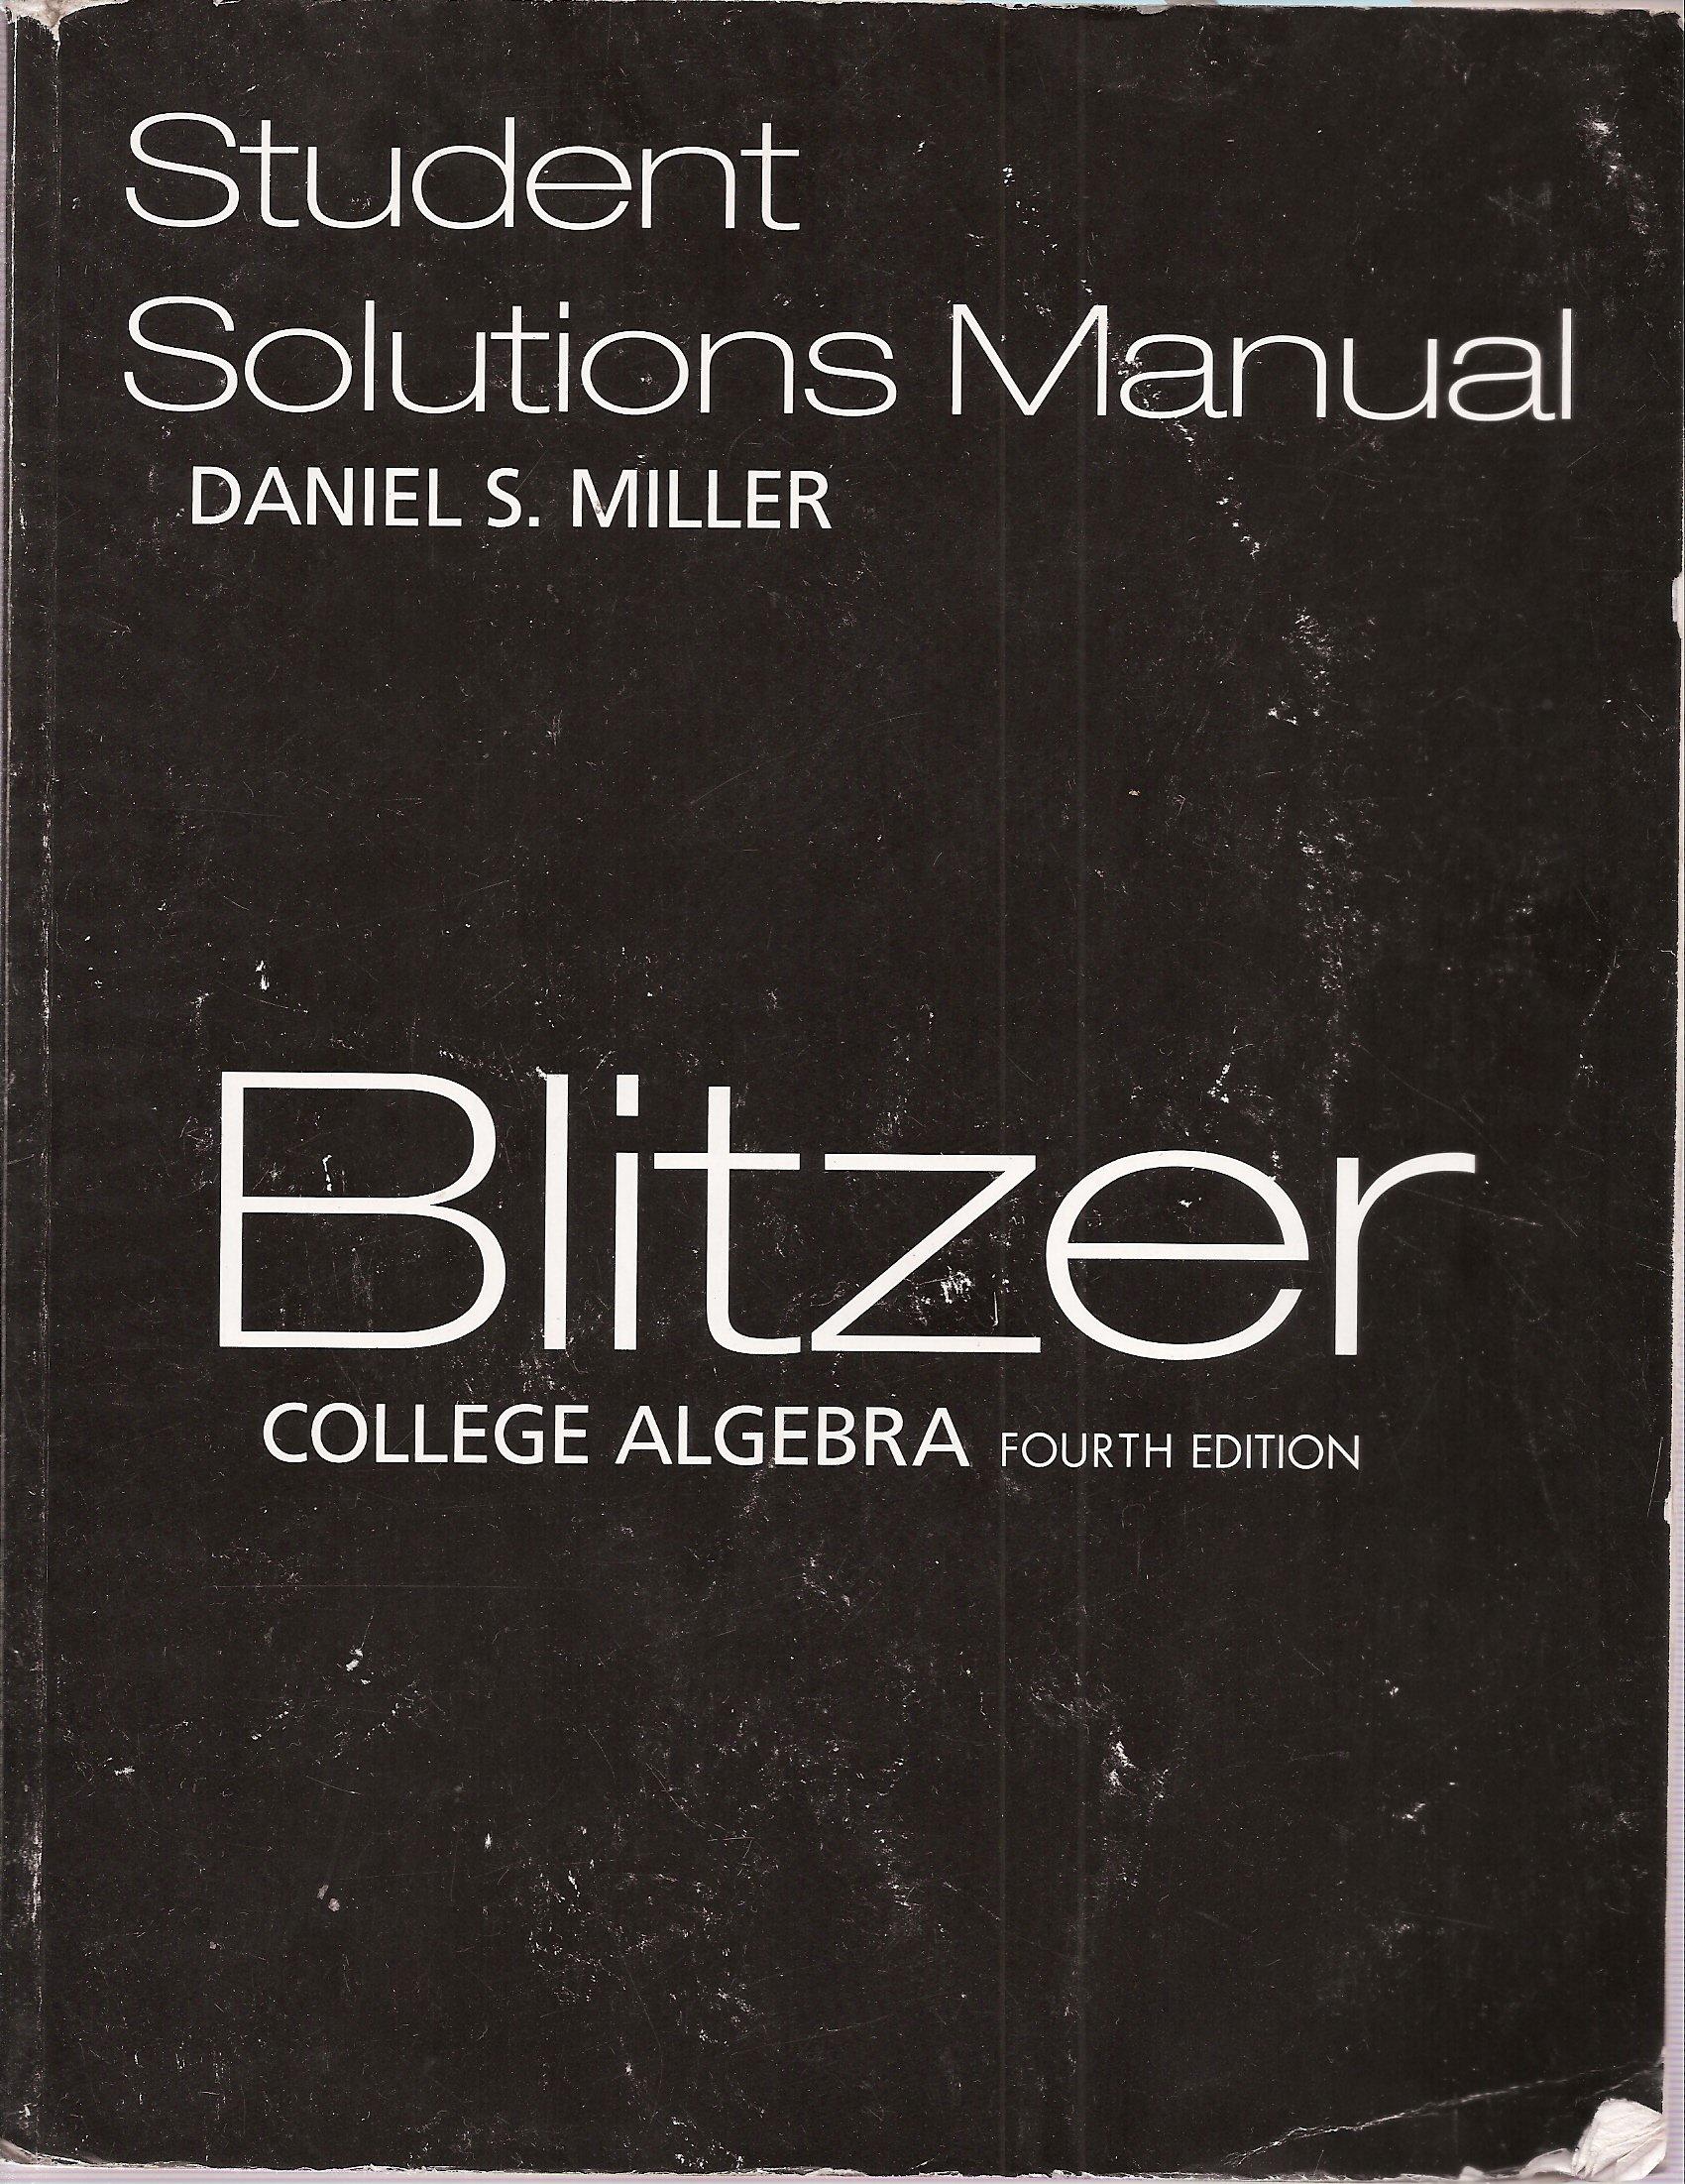 Blitzer: College Algebra (Student Solutions Manual): Daniel S. Miller;  Robert Blitzer: 9780131953642: Amazon.com: Books